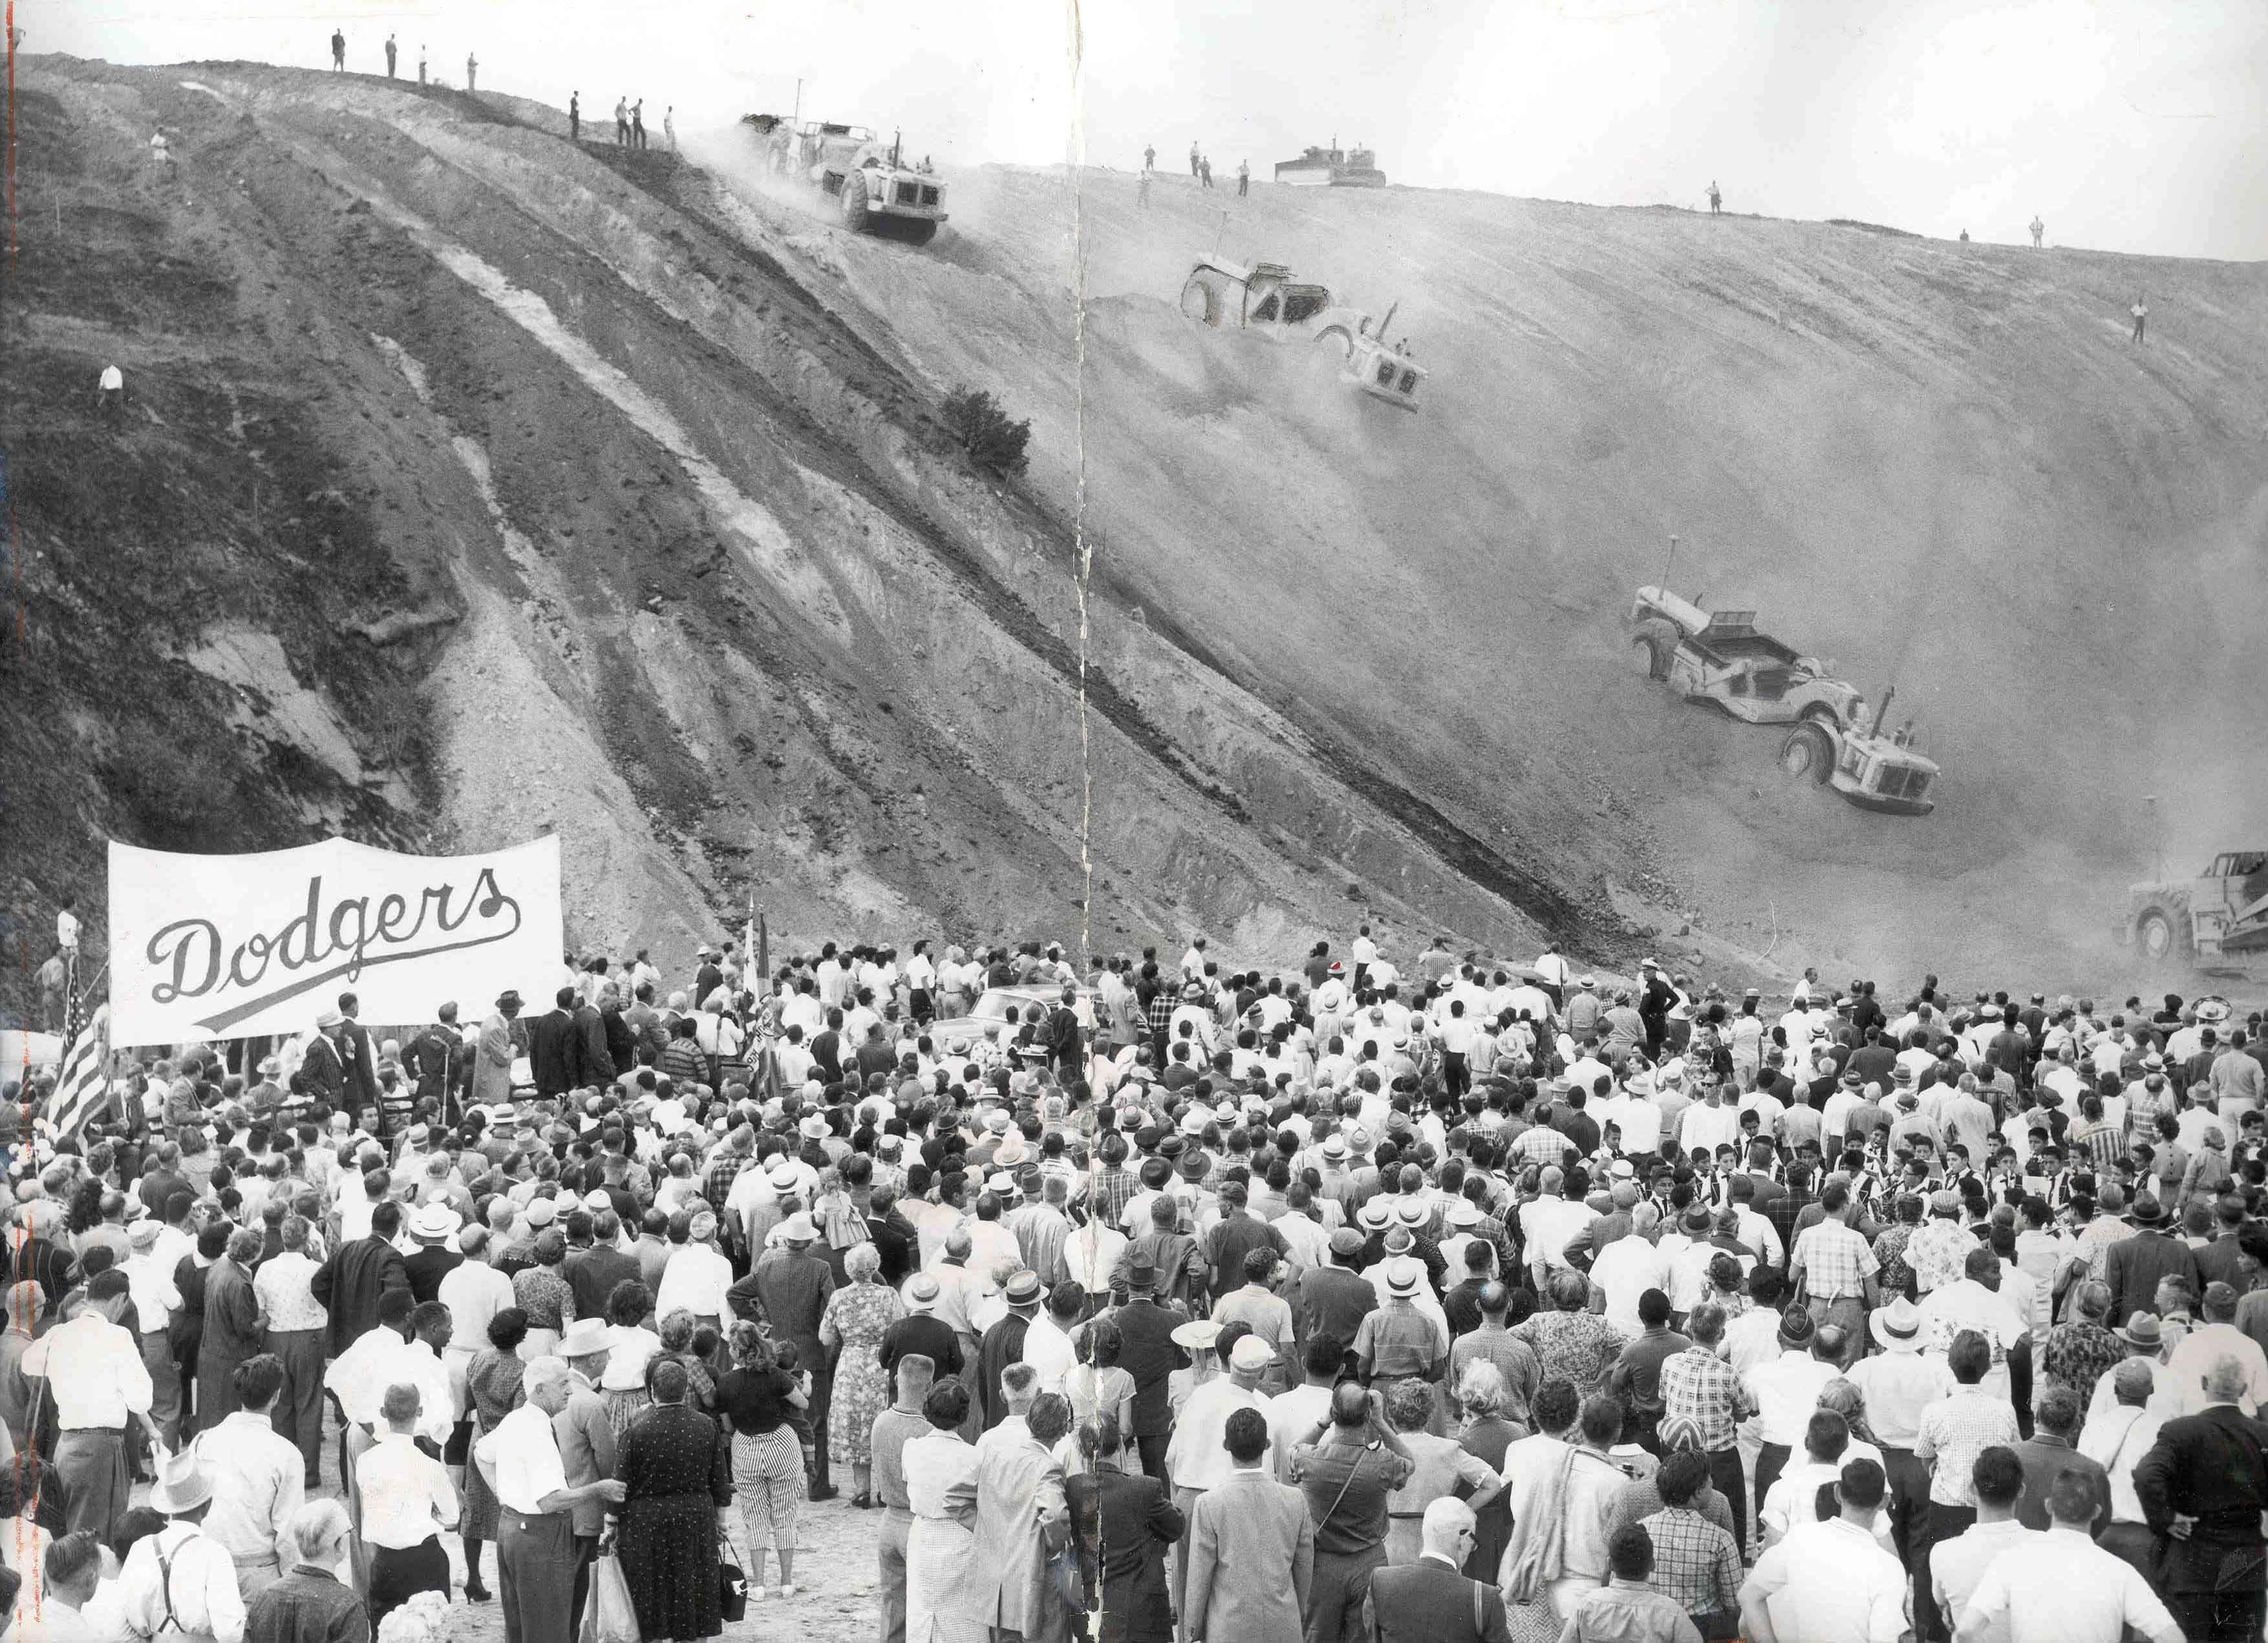 Los Angeles Dodger Stadium Groundbreaking at Chavez Ravine 1960